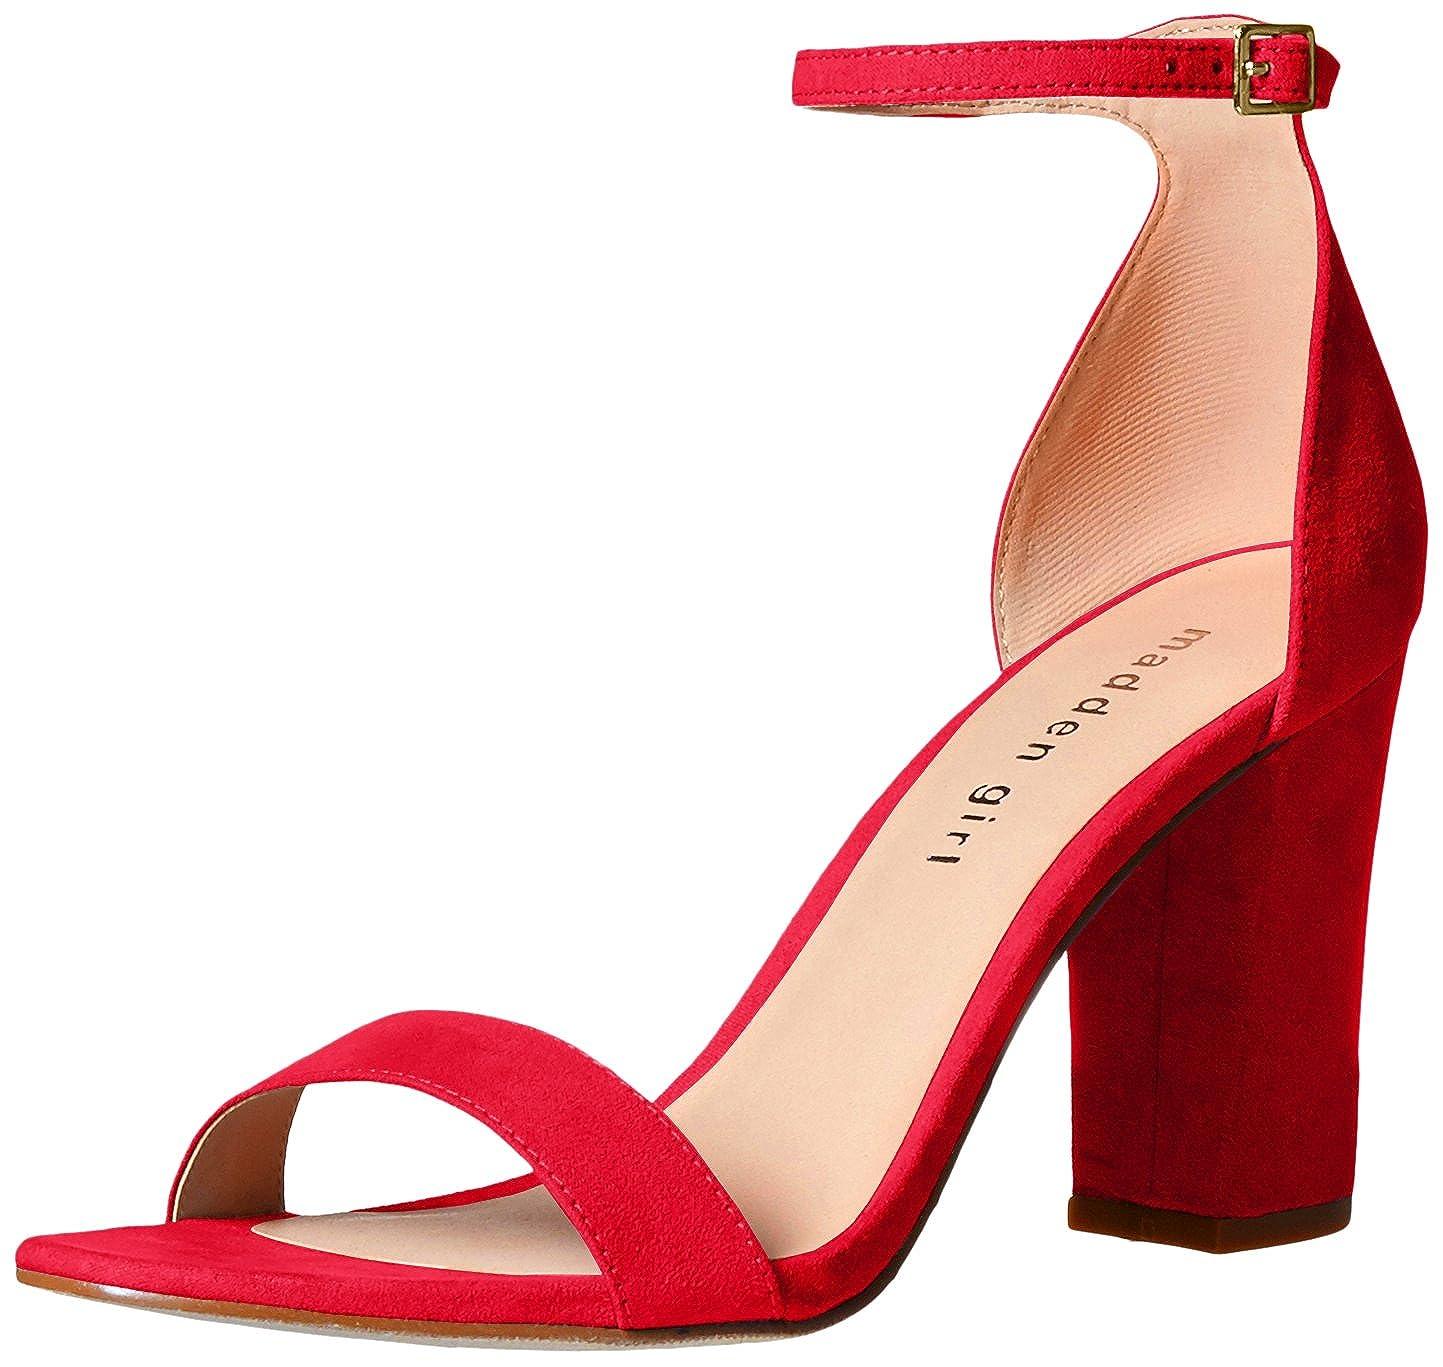 830f809ca2f4 Amazon.com  Madden Girl Women s BEELLA Heeled Sandal